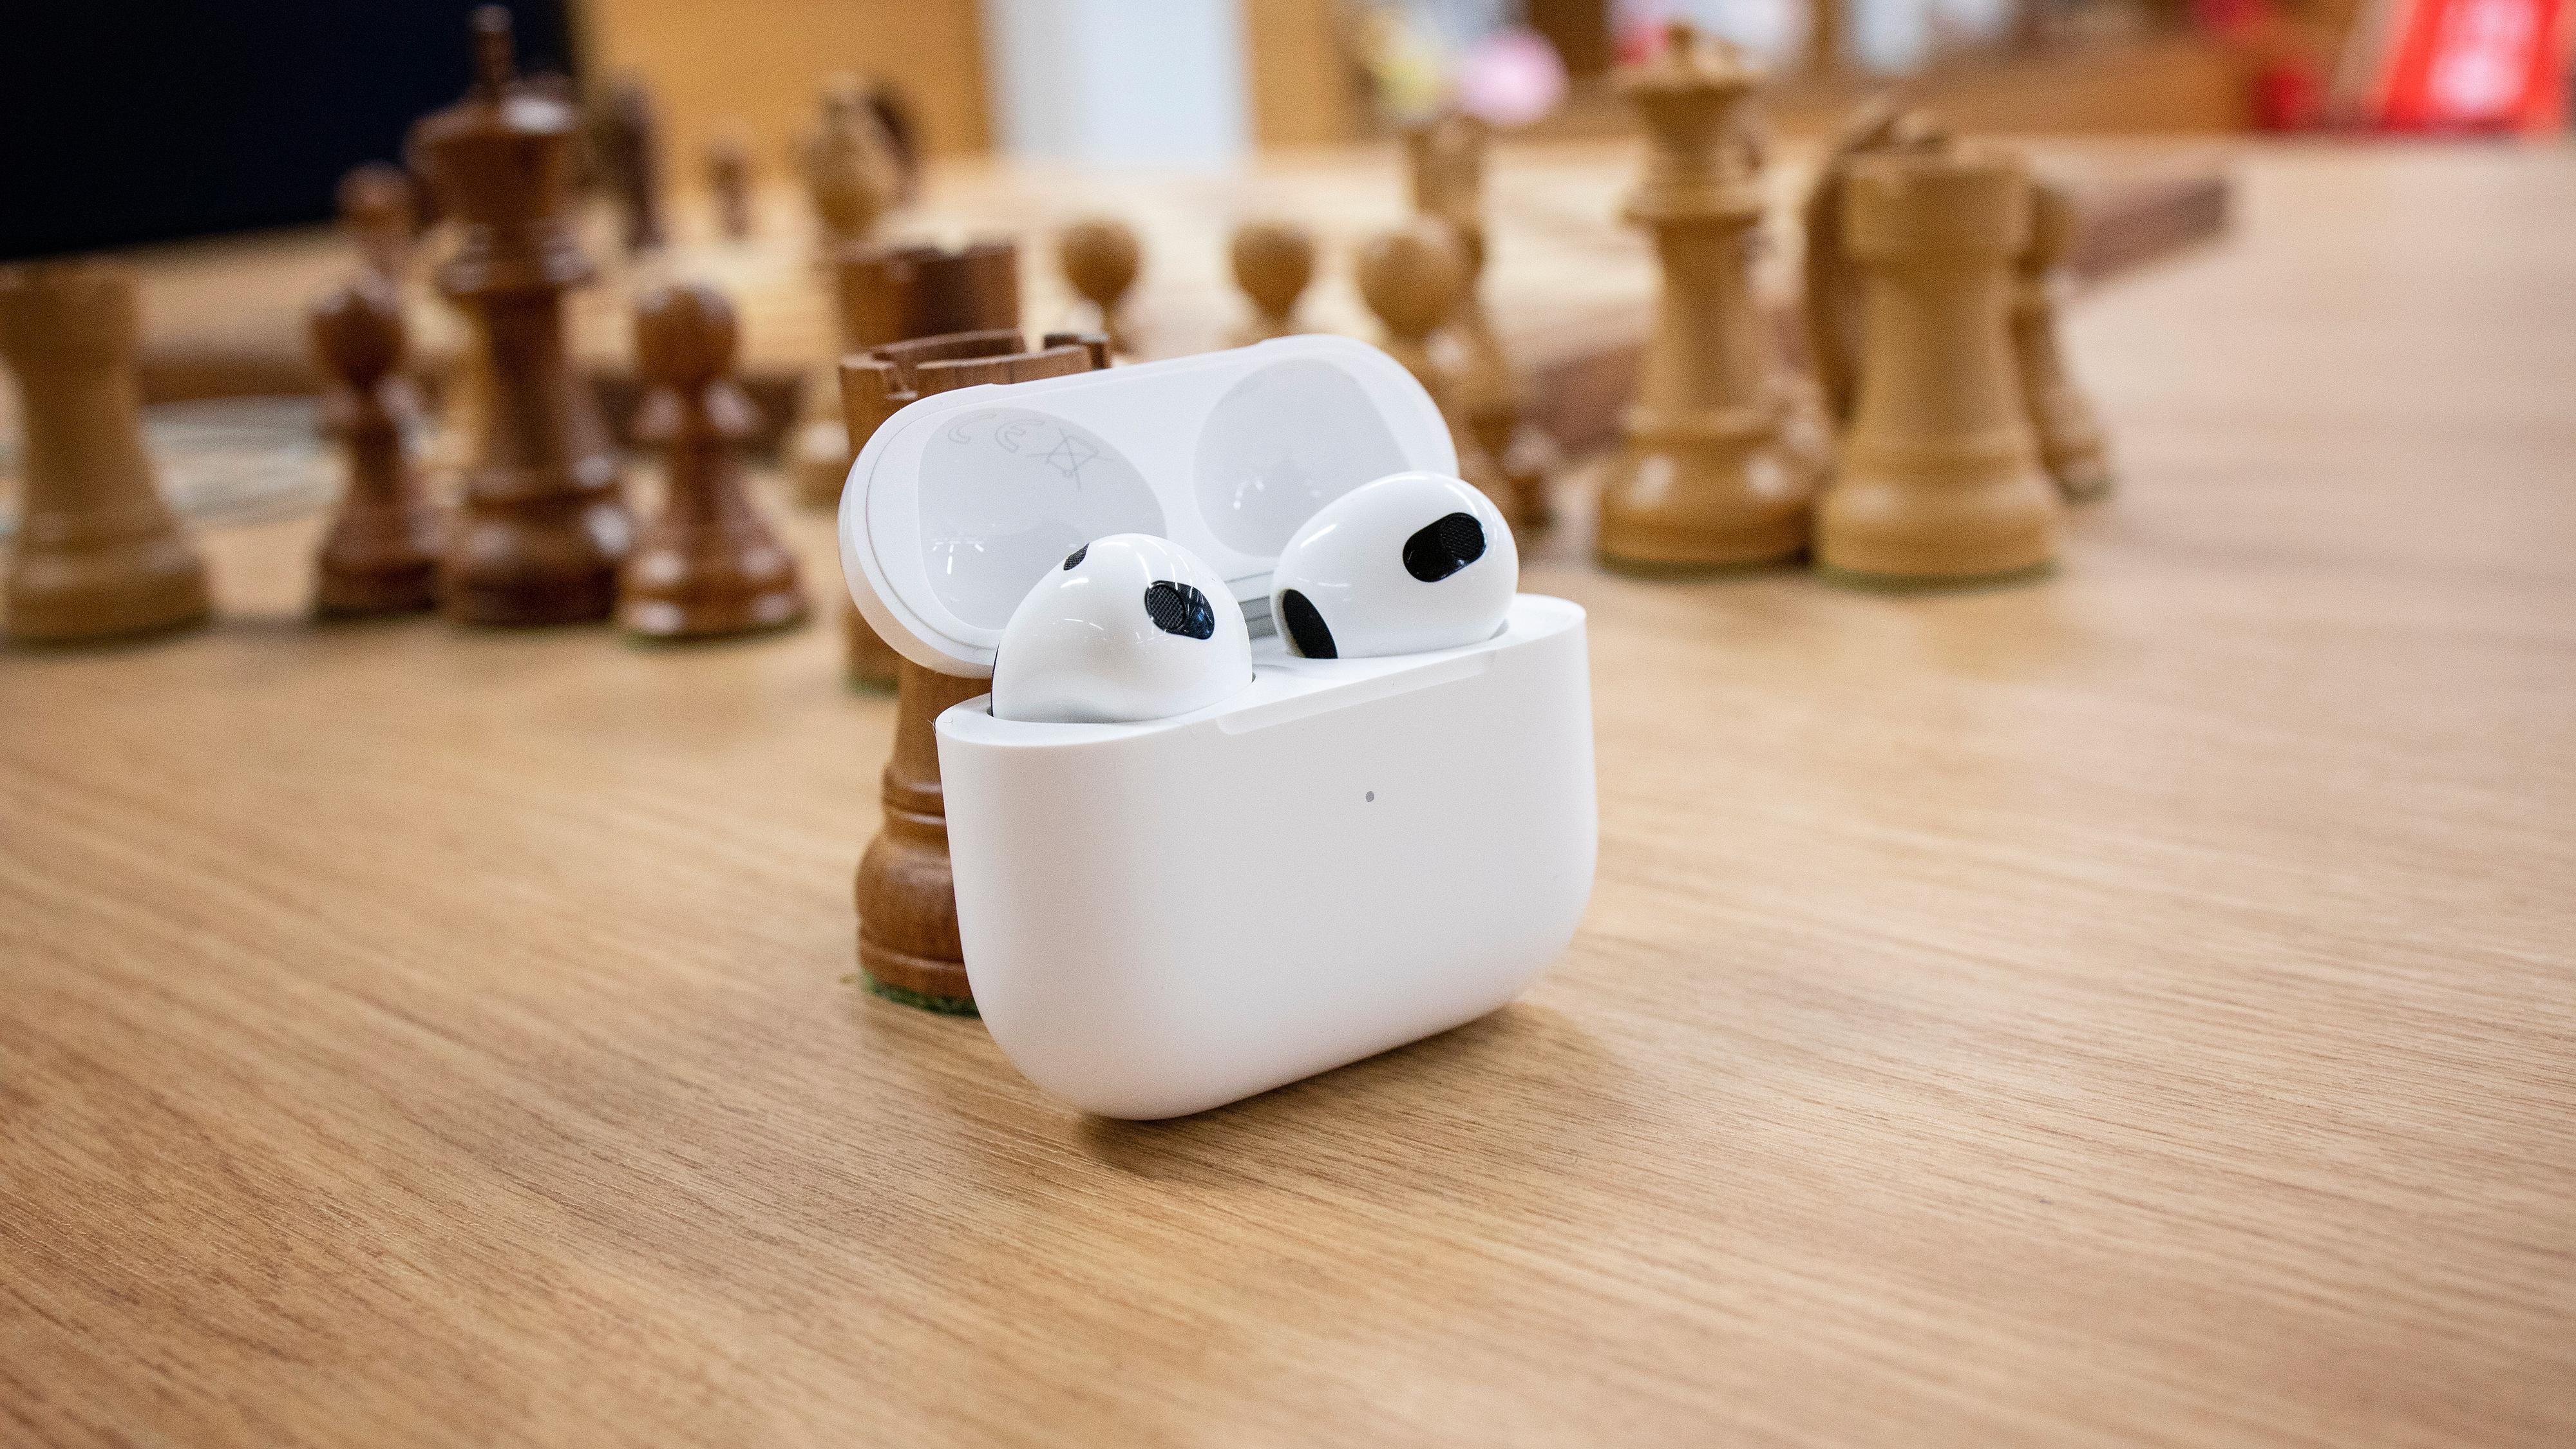 Apples nye AirPods byr på forbedringer over nesten hele fjøla